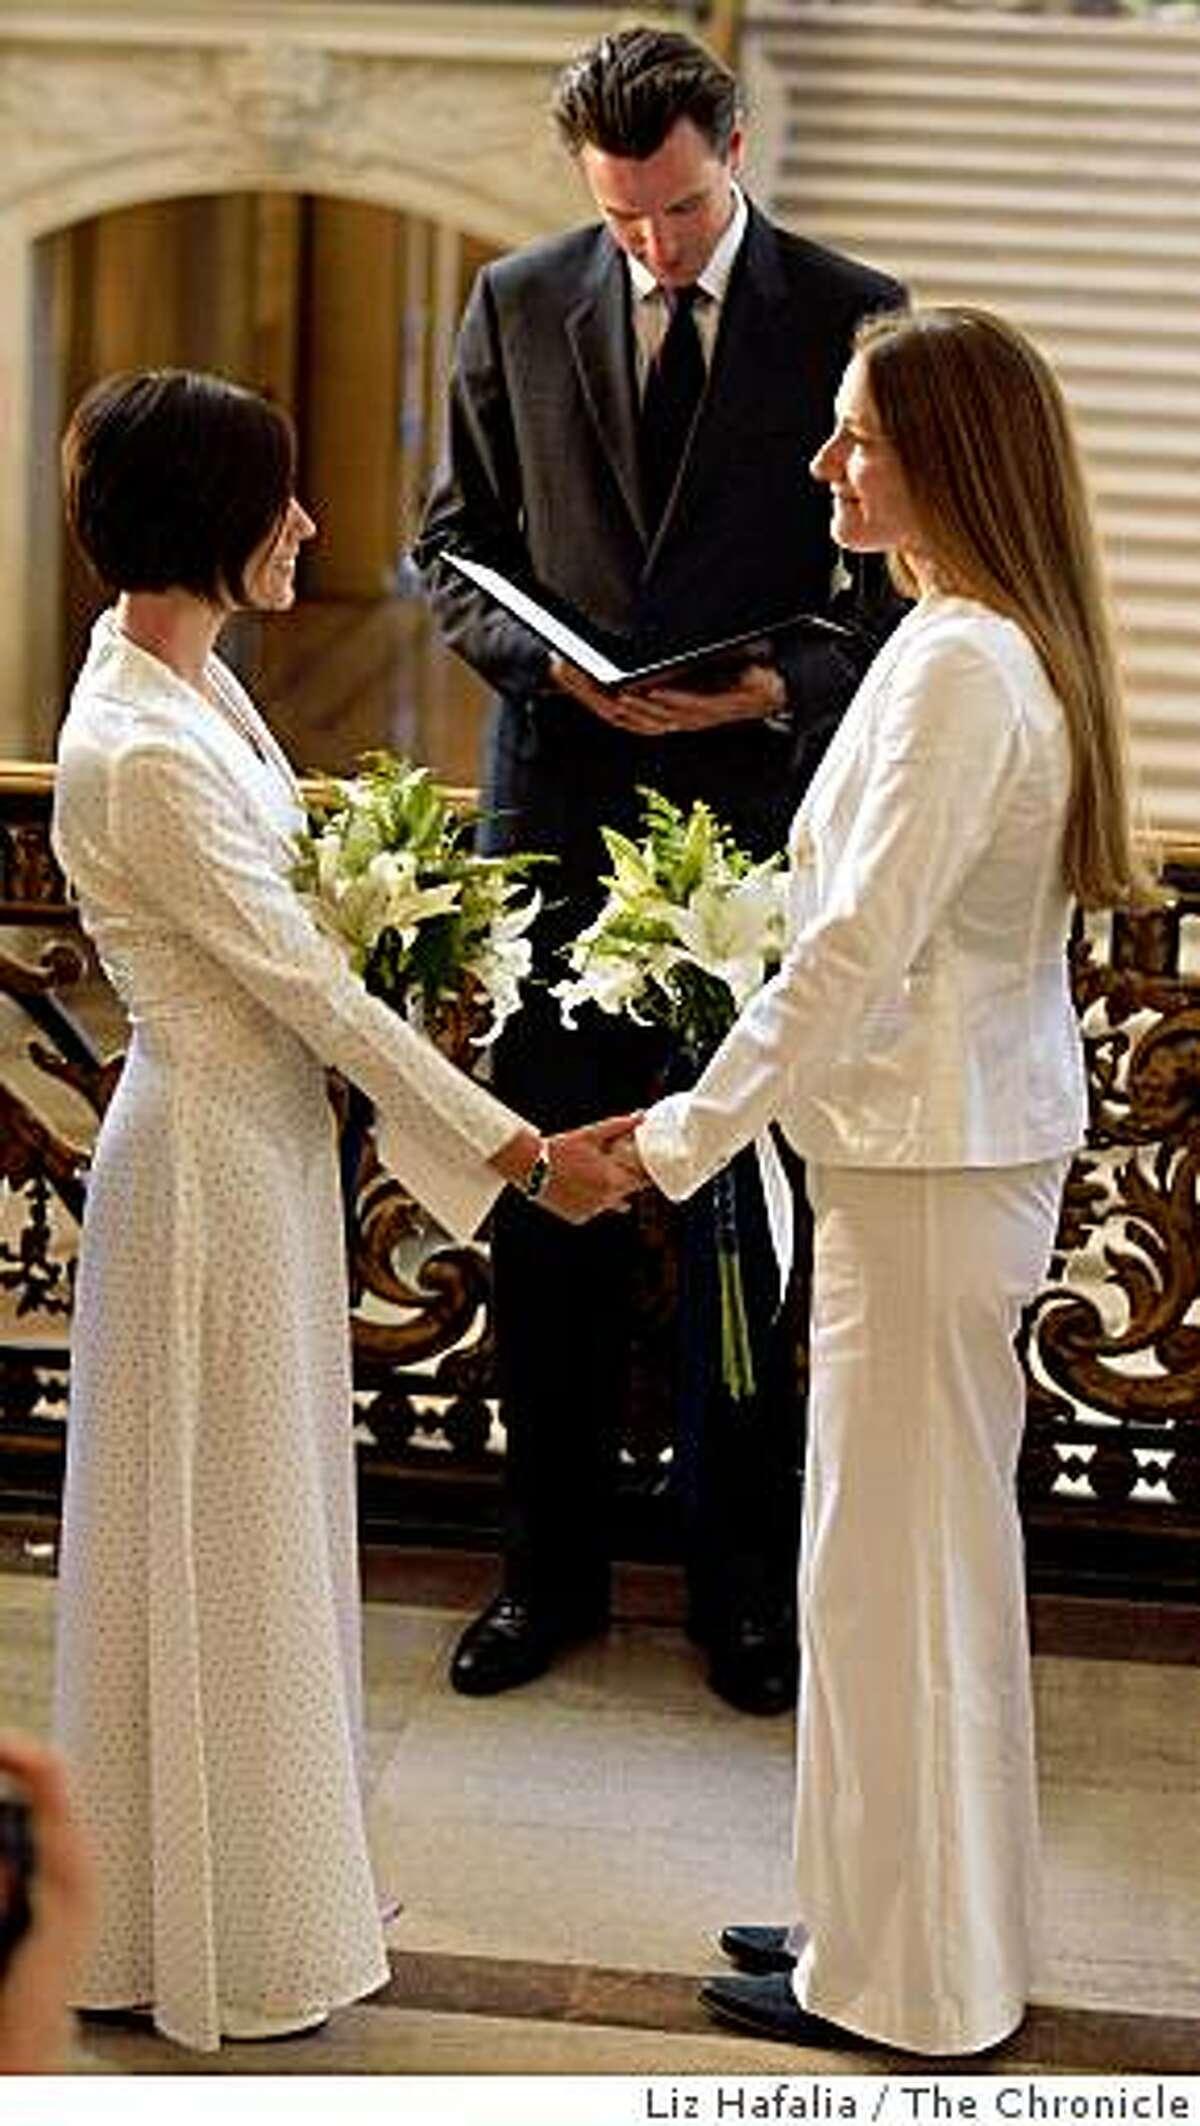 Mayor Gavin Newsom marries Erin Carder (left) and Kerri McCoy at City Hall in San Francisco, Calif., on Friday, October 10, 2008.